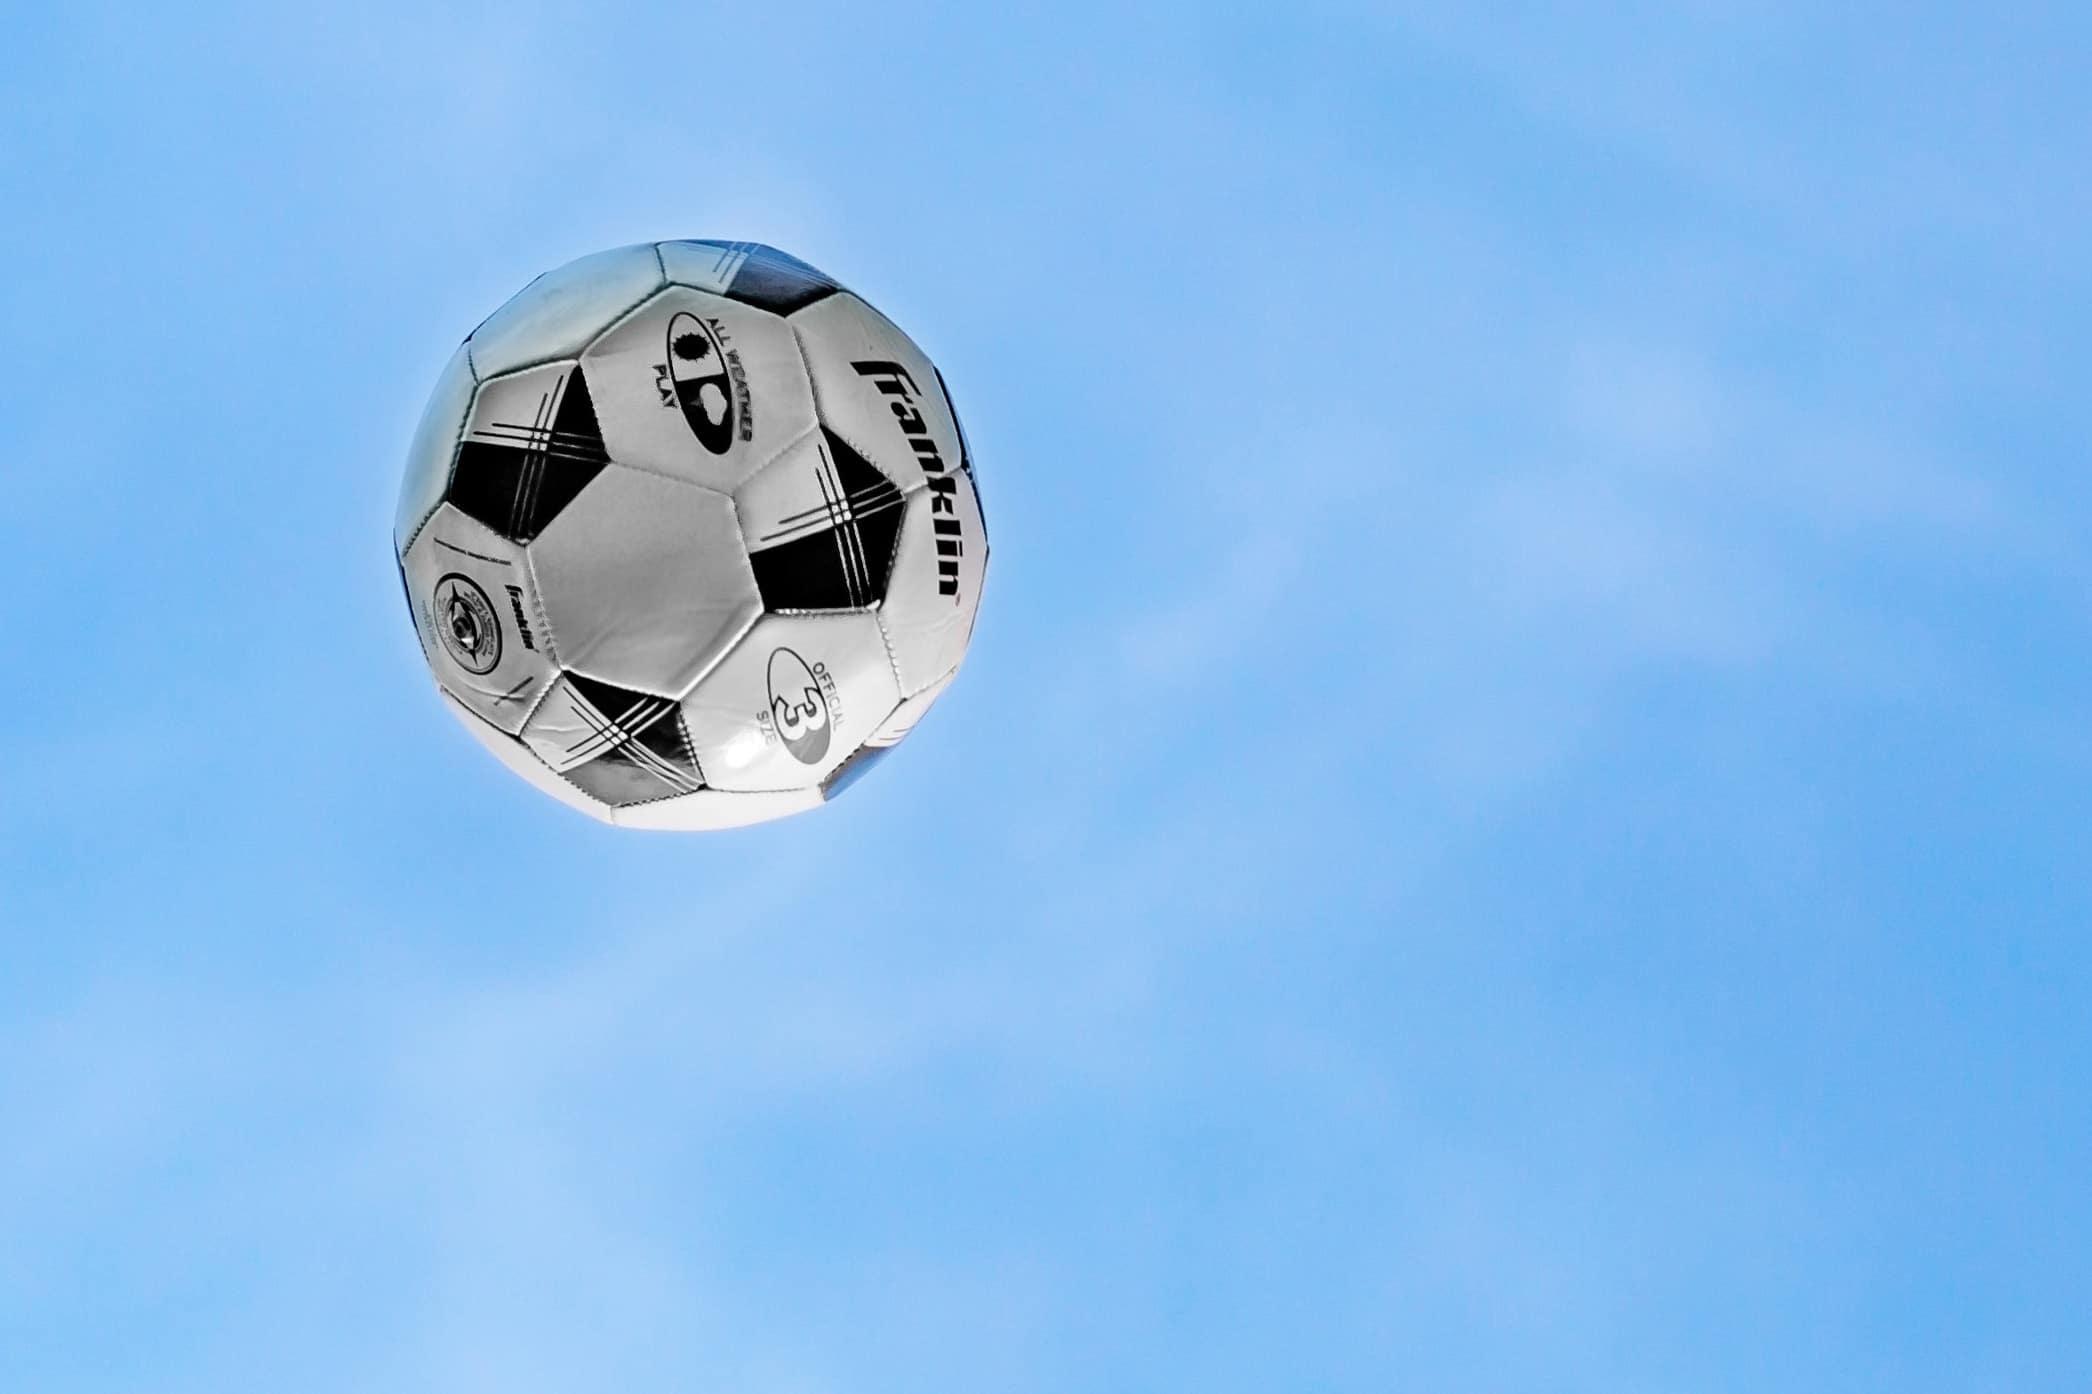 Fußball am Himmel